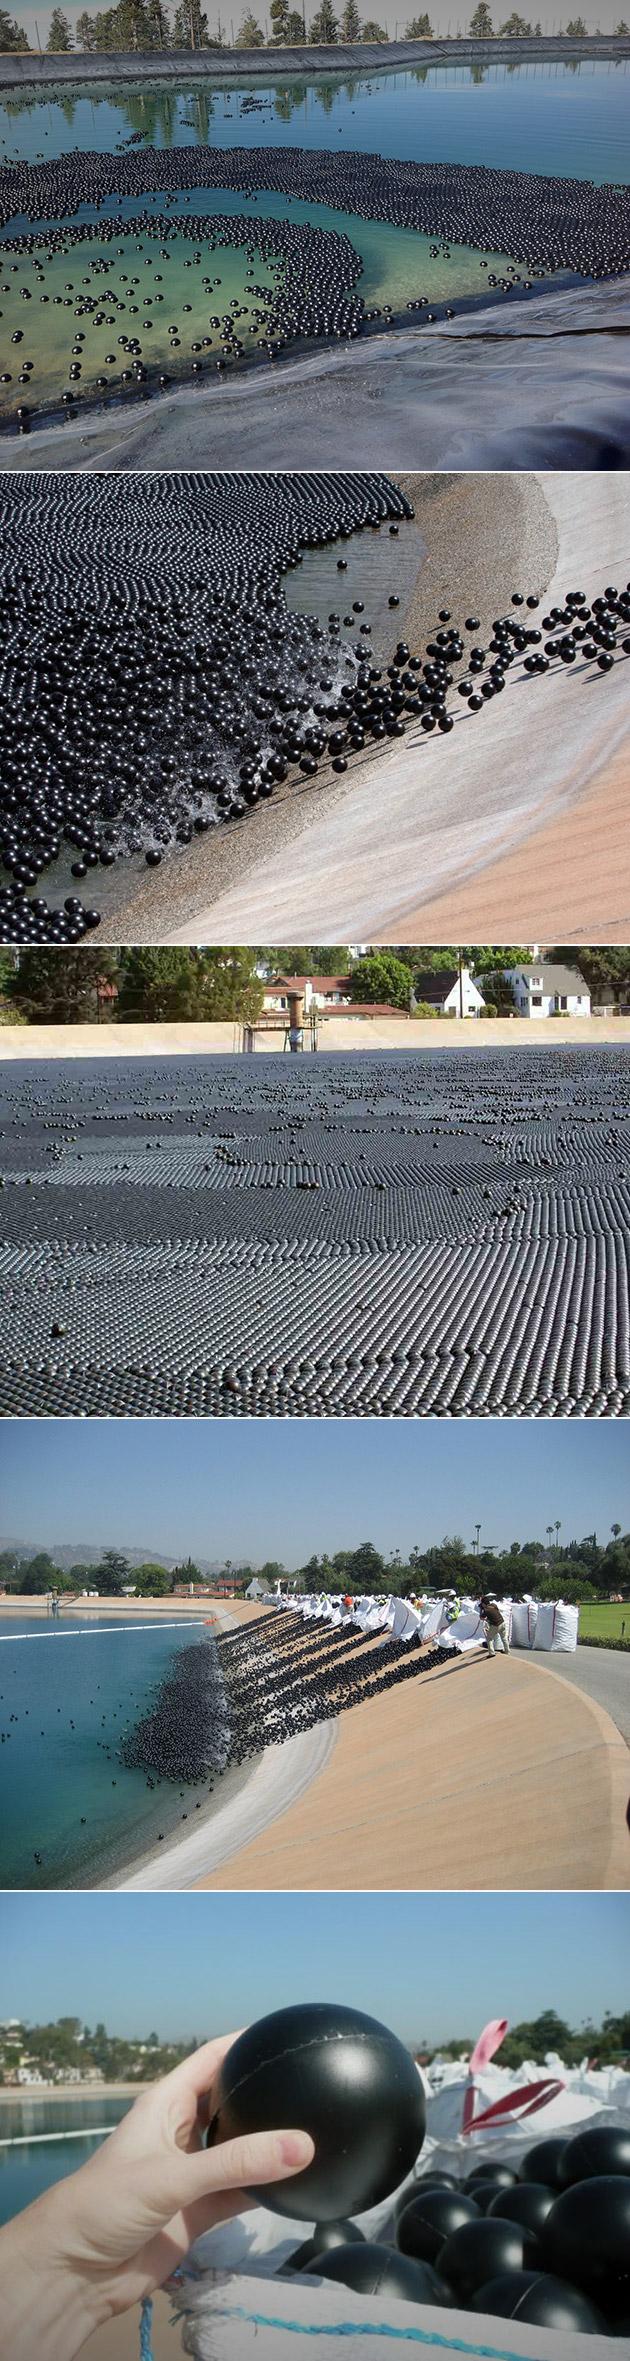 Los Angeles Reservoir Black Balls